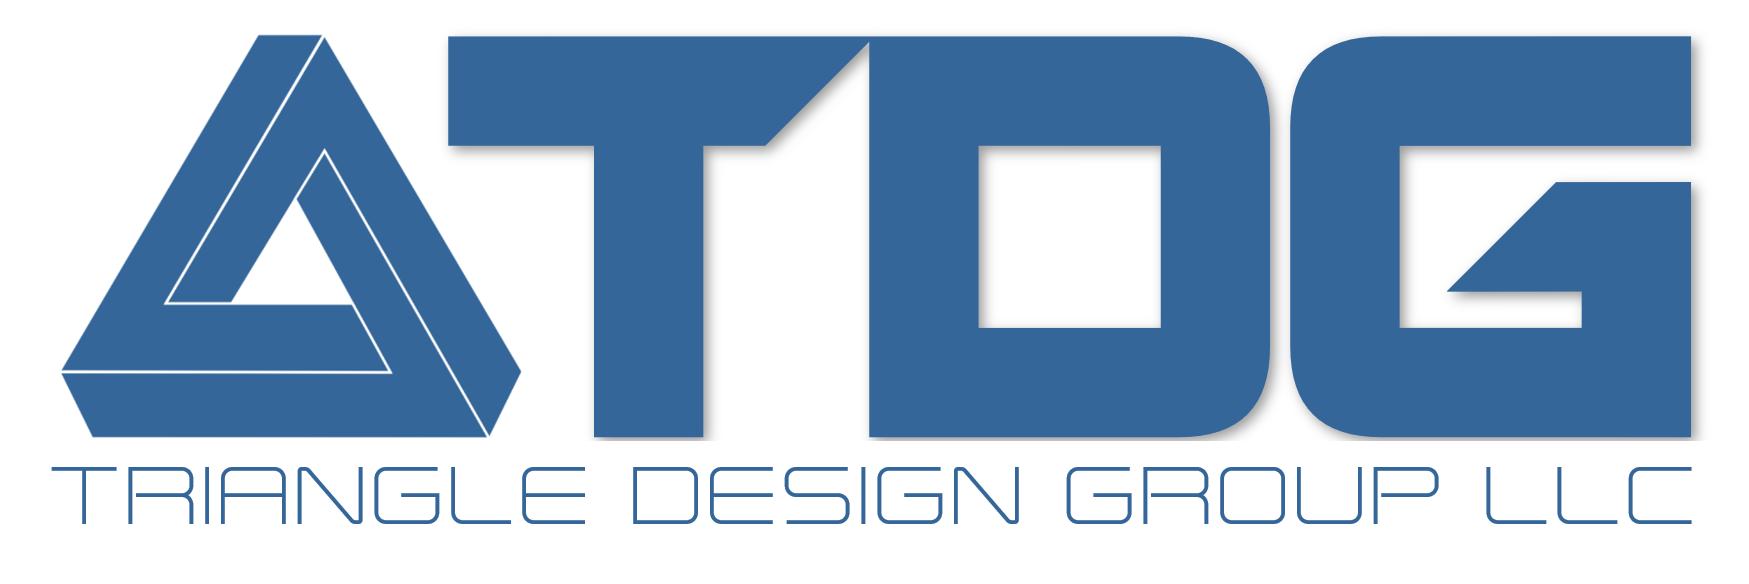 Triangle Design Group llc